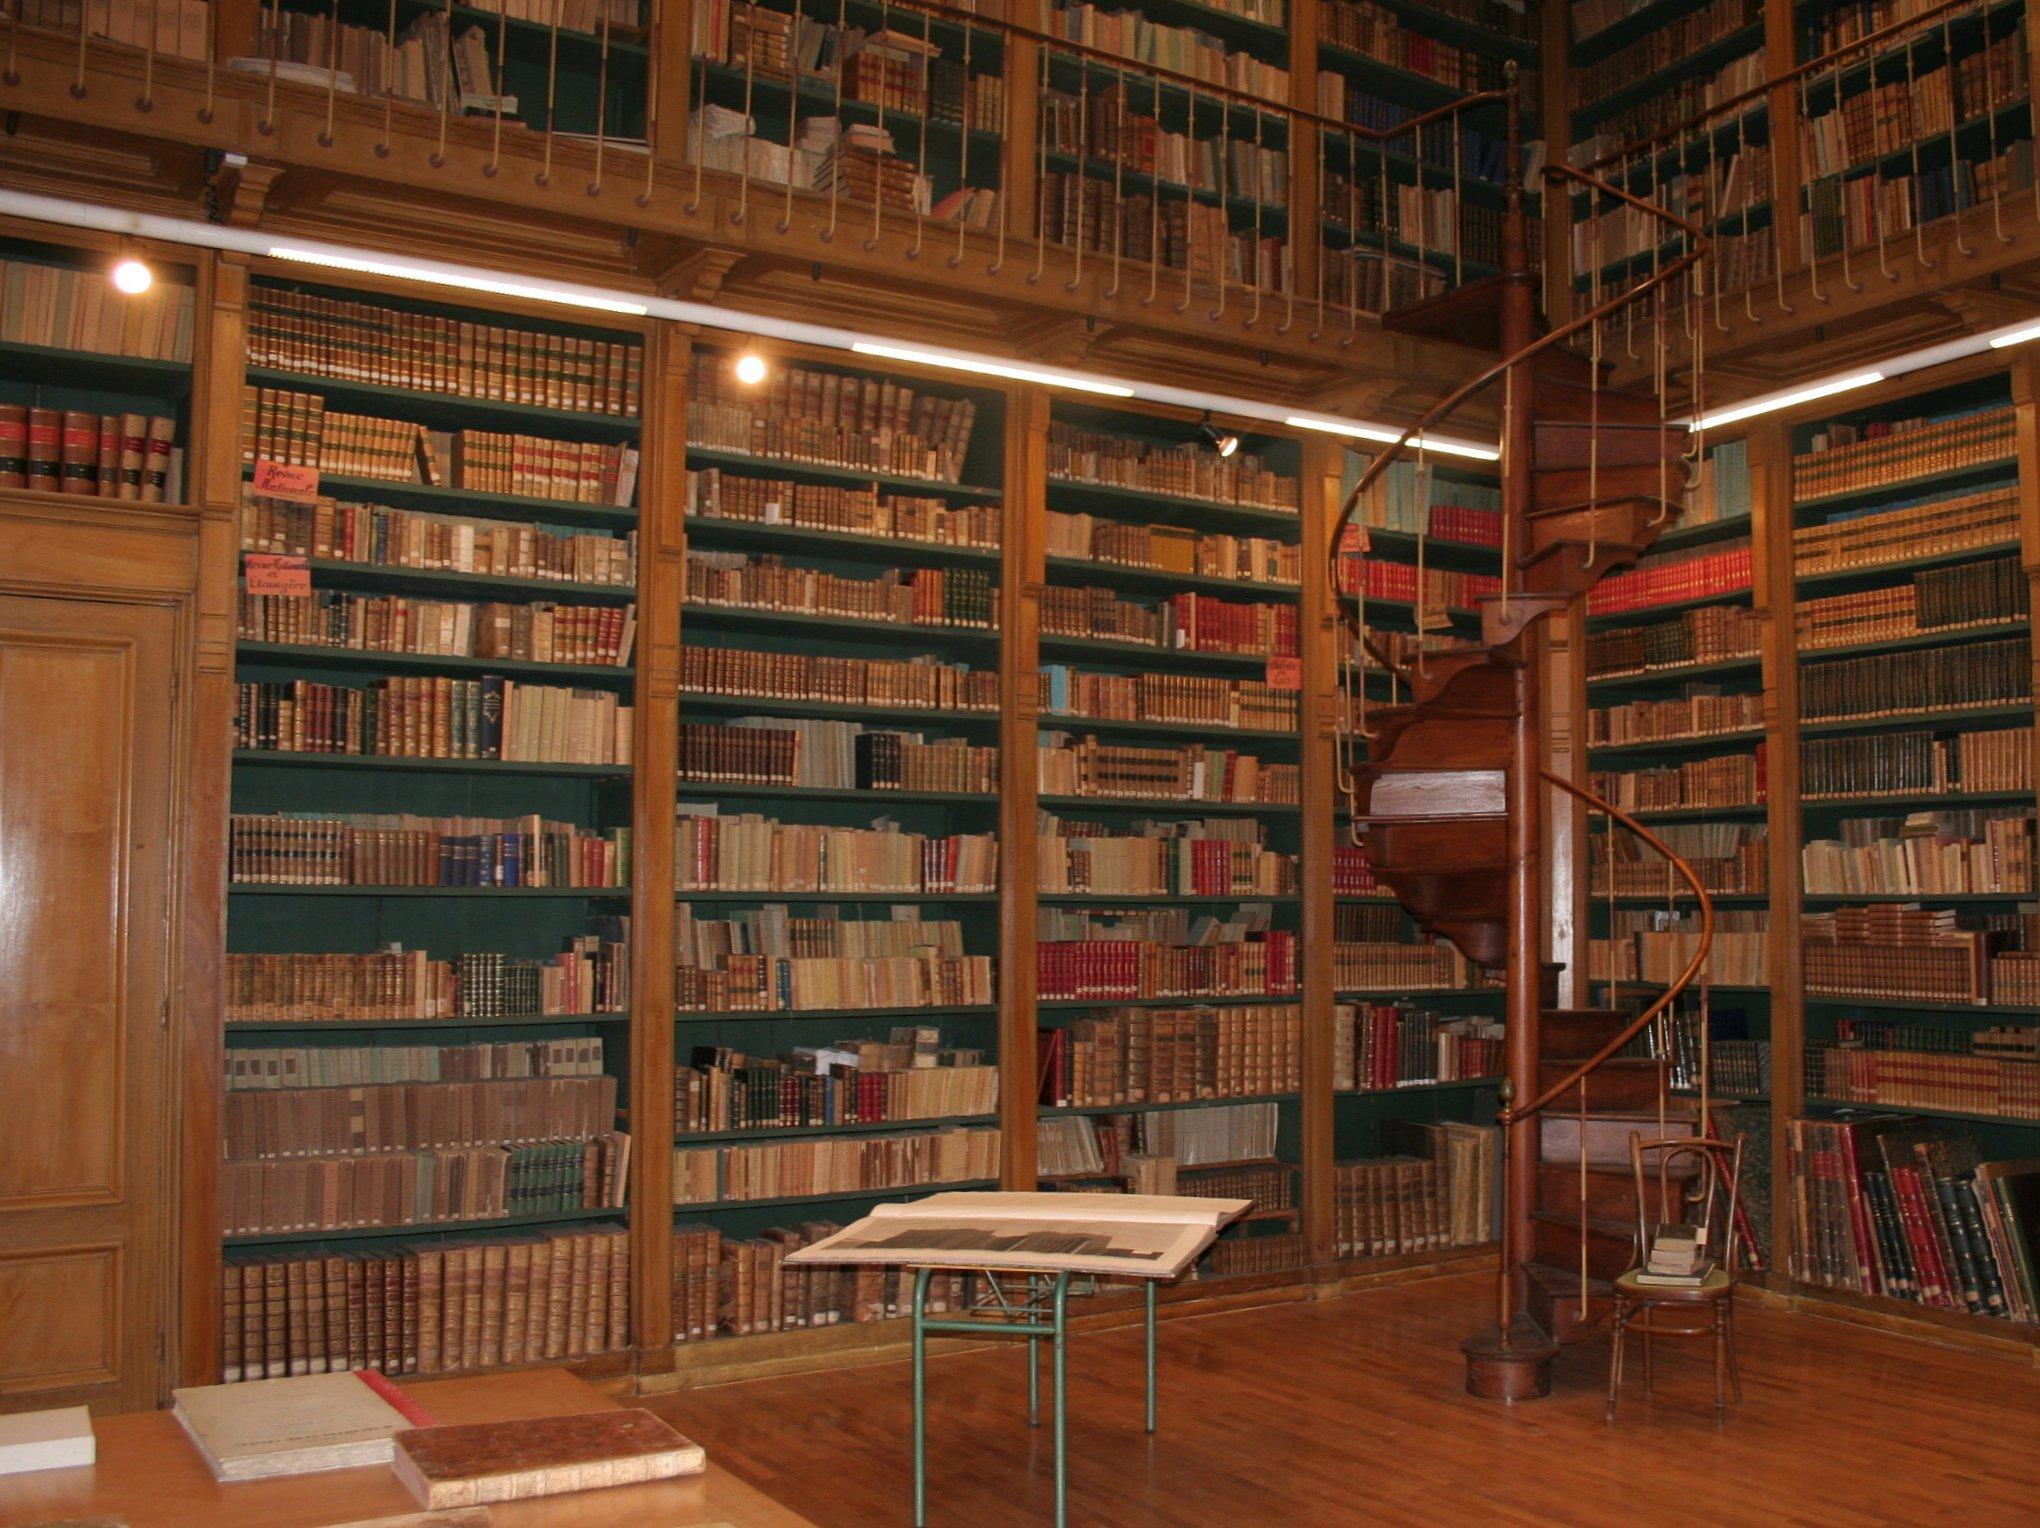 file grande bibliotheque wikimedia commons. Black Bedroom Furniture Sets. Home Design Ideas